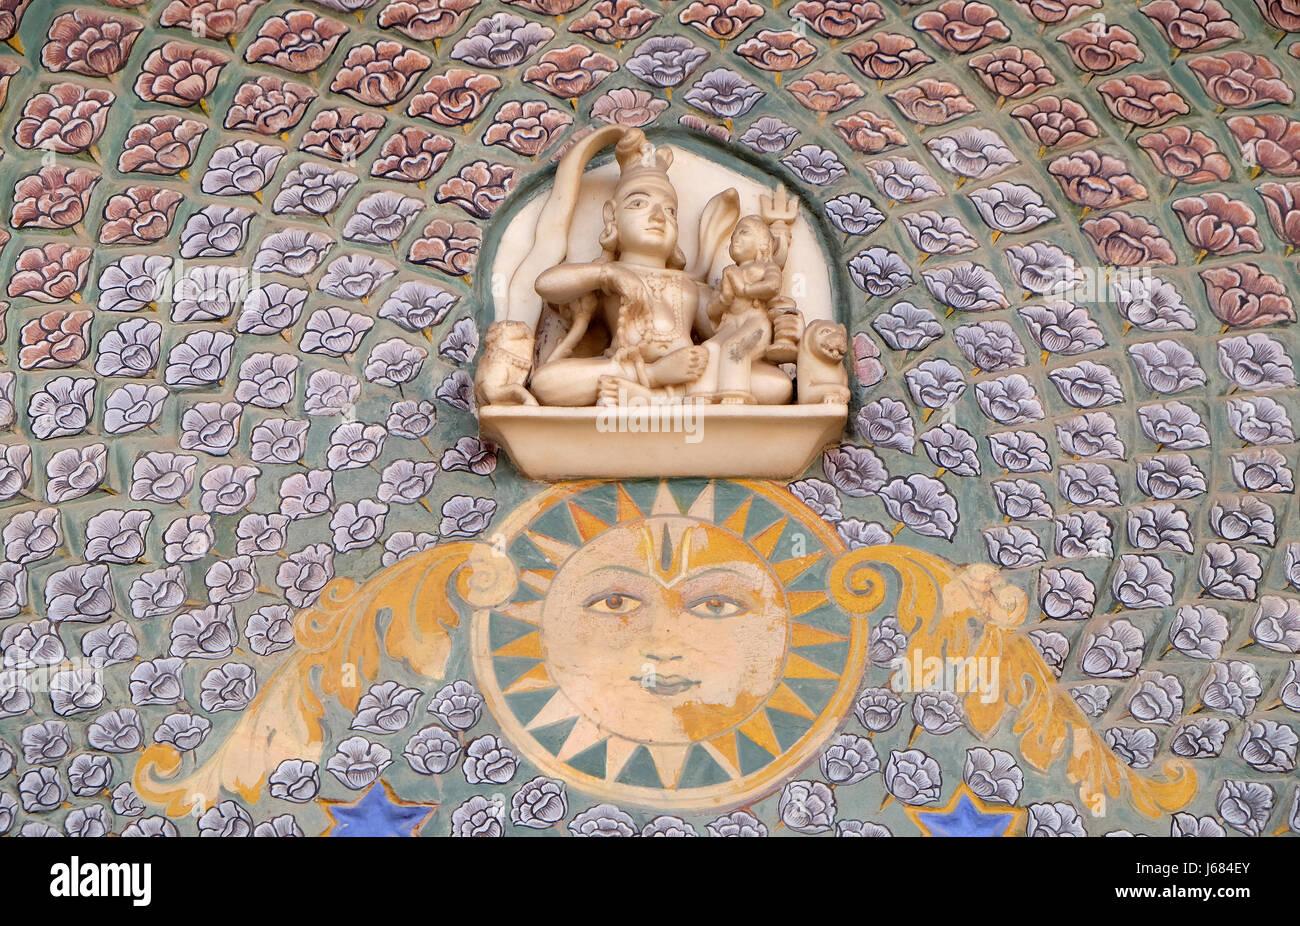 Rose Gate at the Chandra Mahal, Jaipur City Palace, Rajasthan, India. In the courtyard Pitam Niwas Chowk. - Stock Image